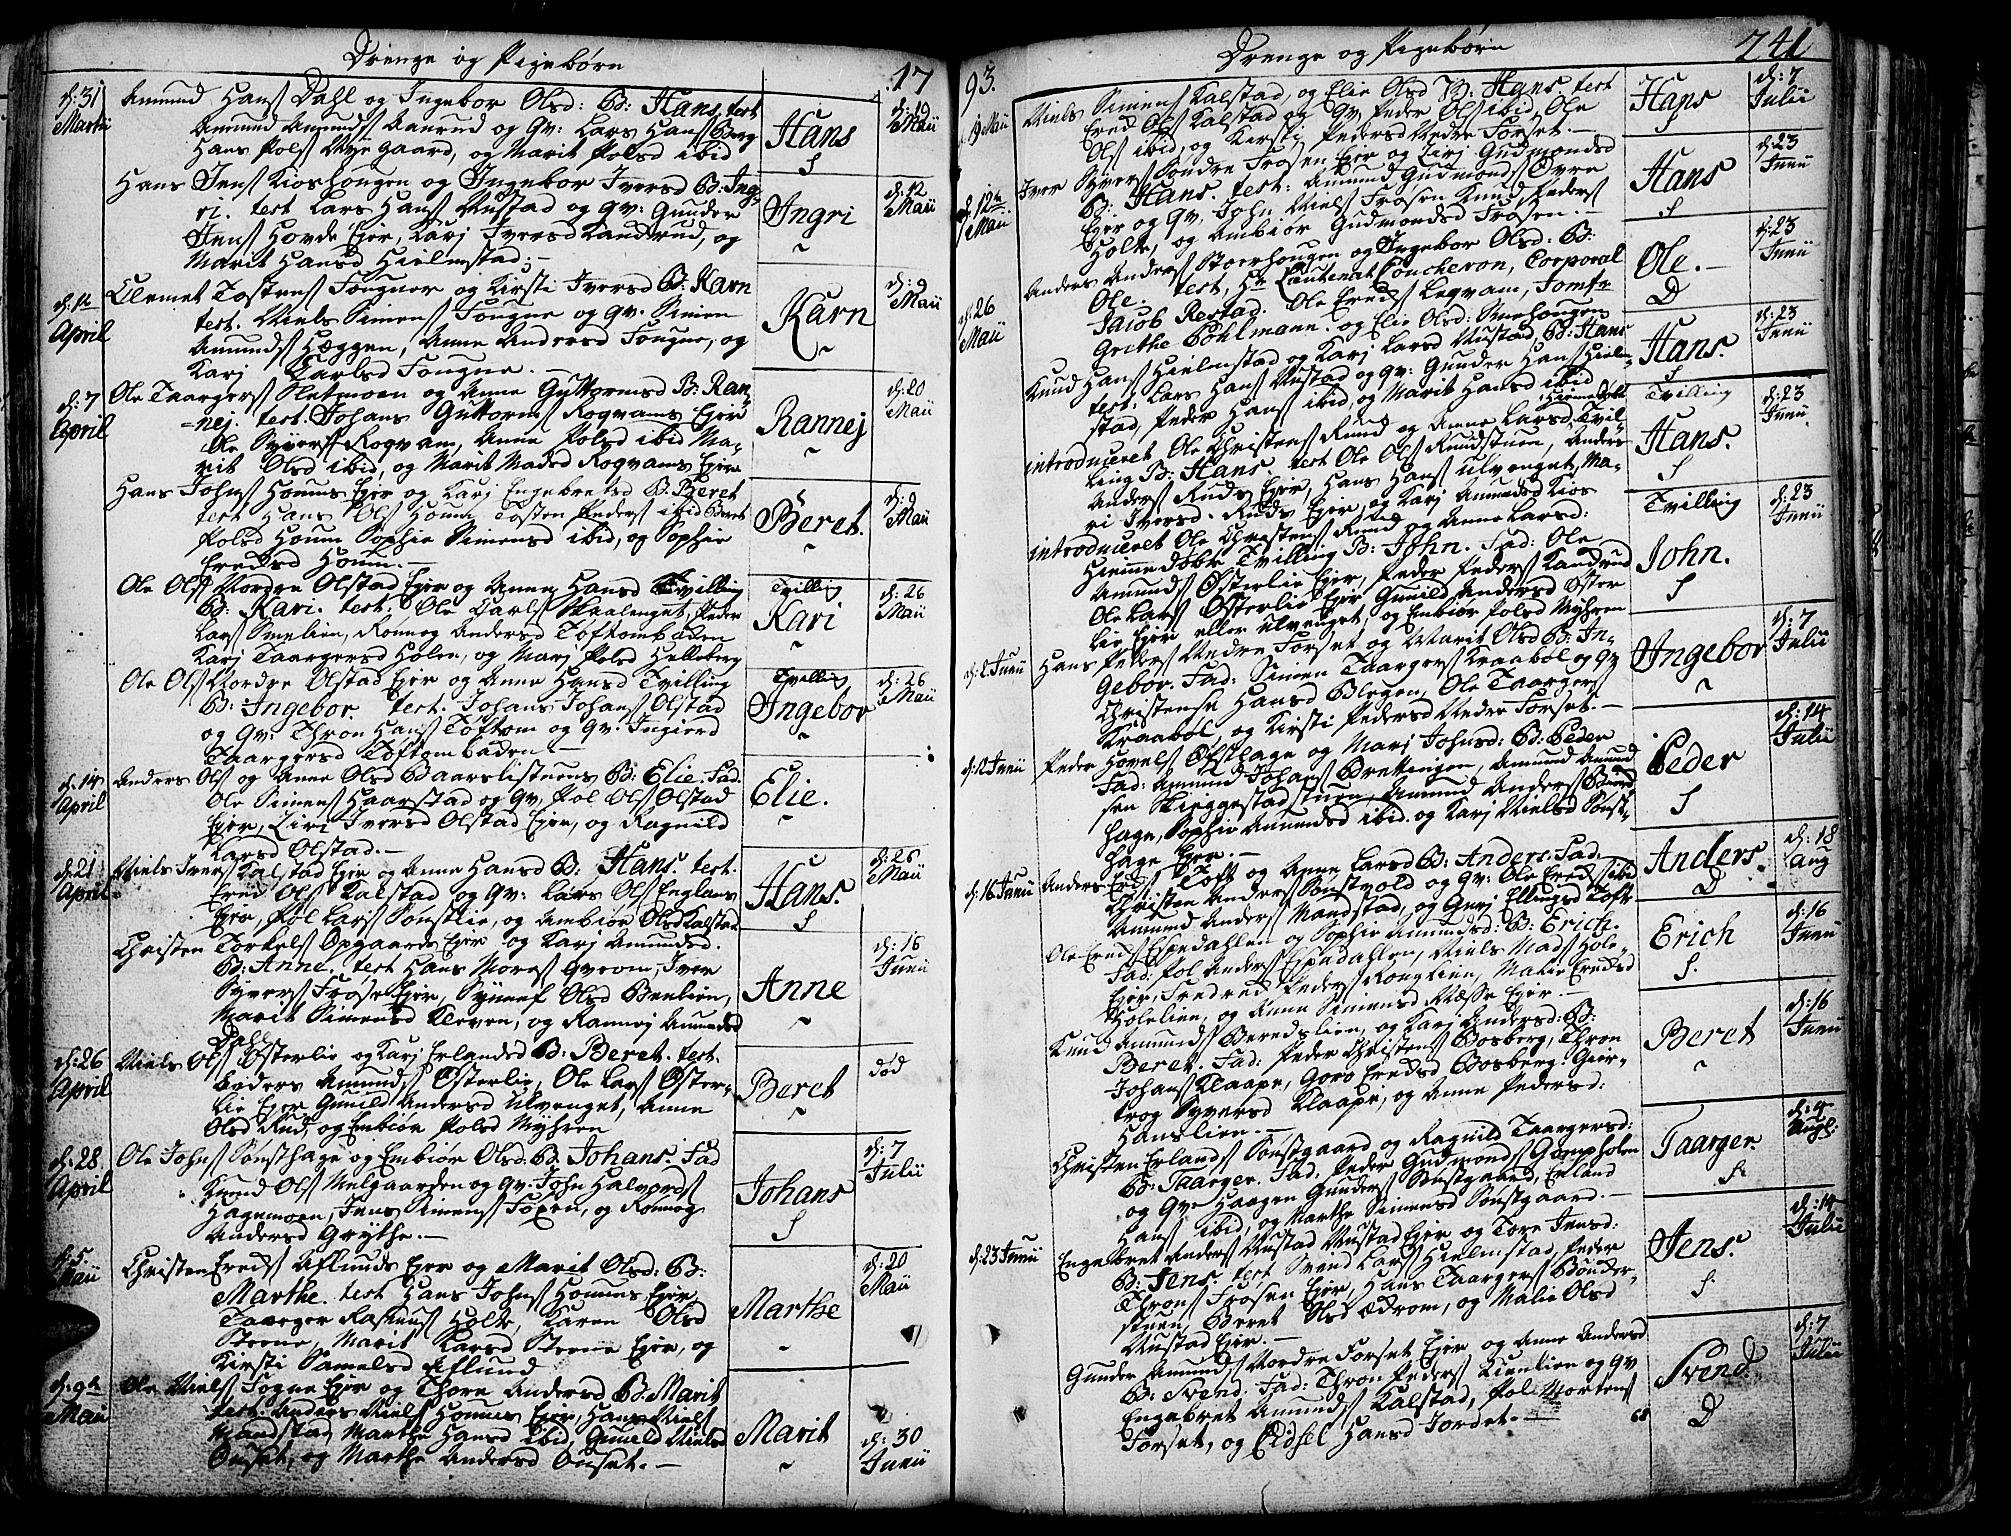 SAH, Gausdal prestekontor, Ministerialbok nr. 3, 1758-1809, s. 241